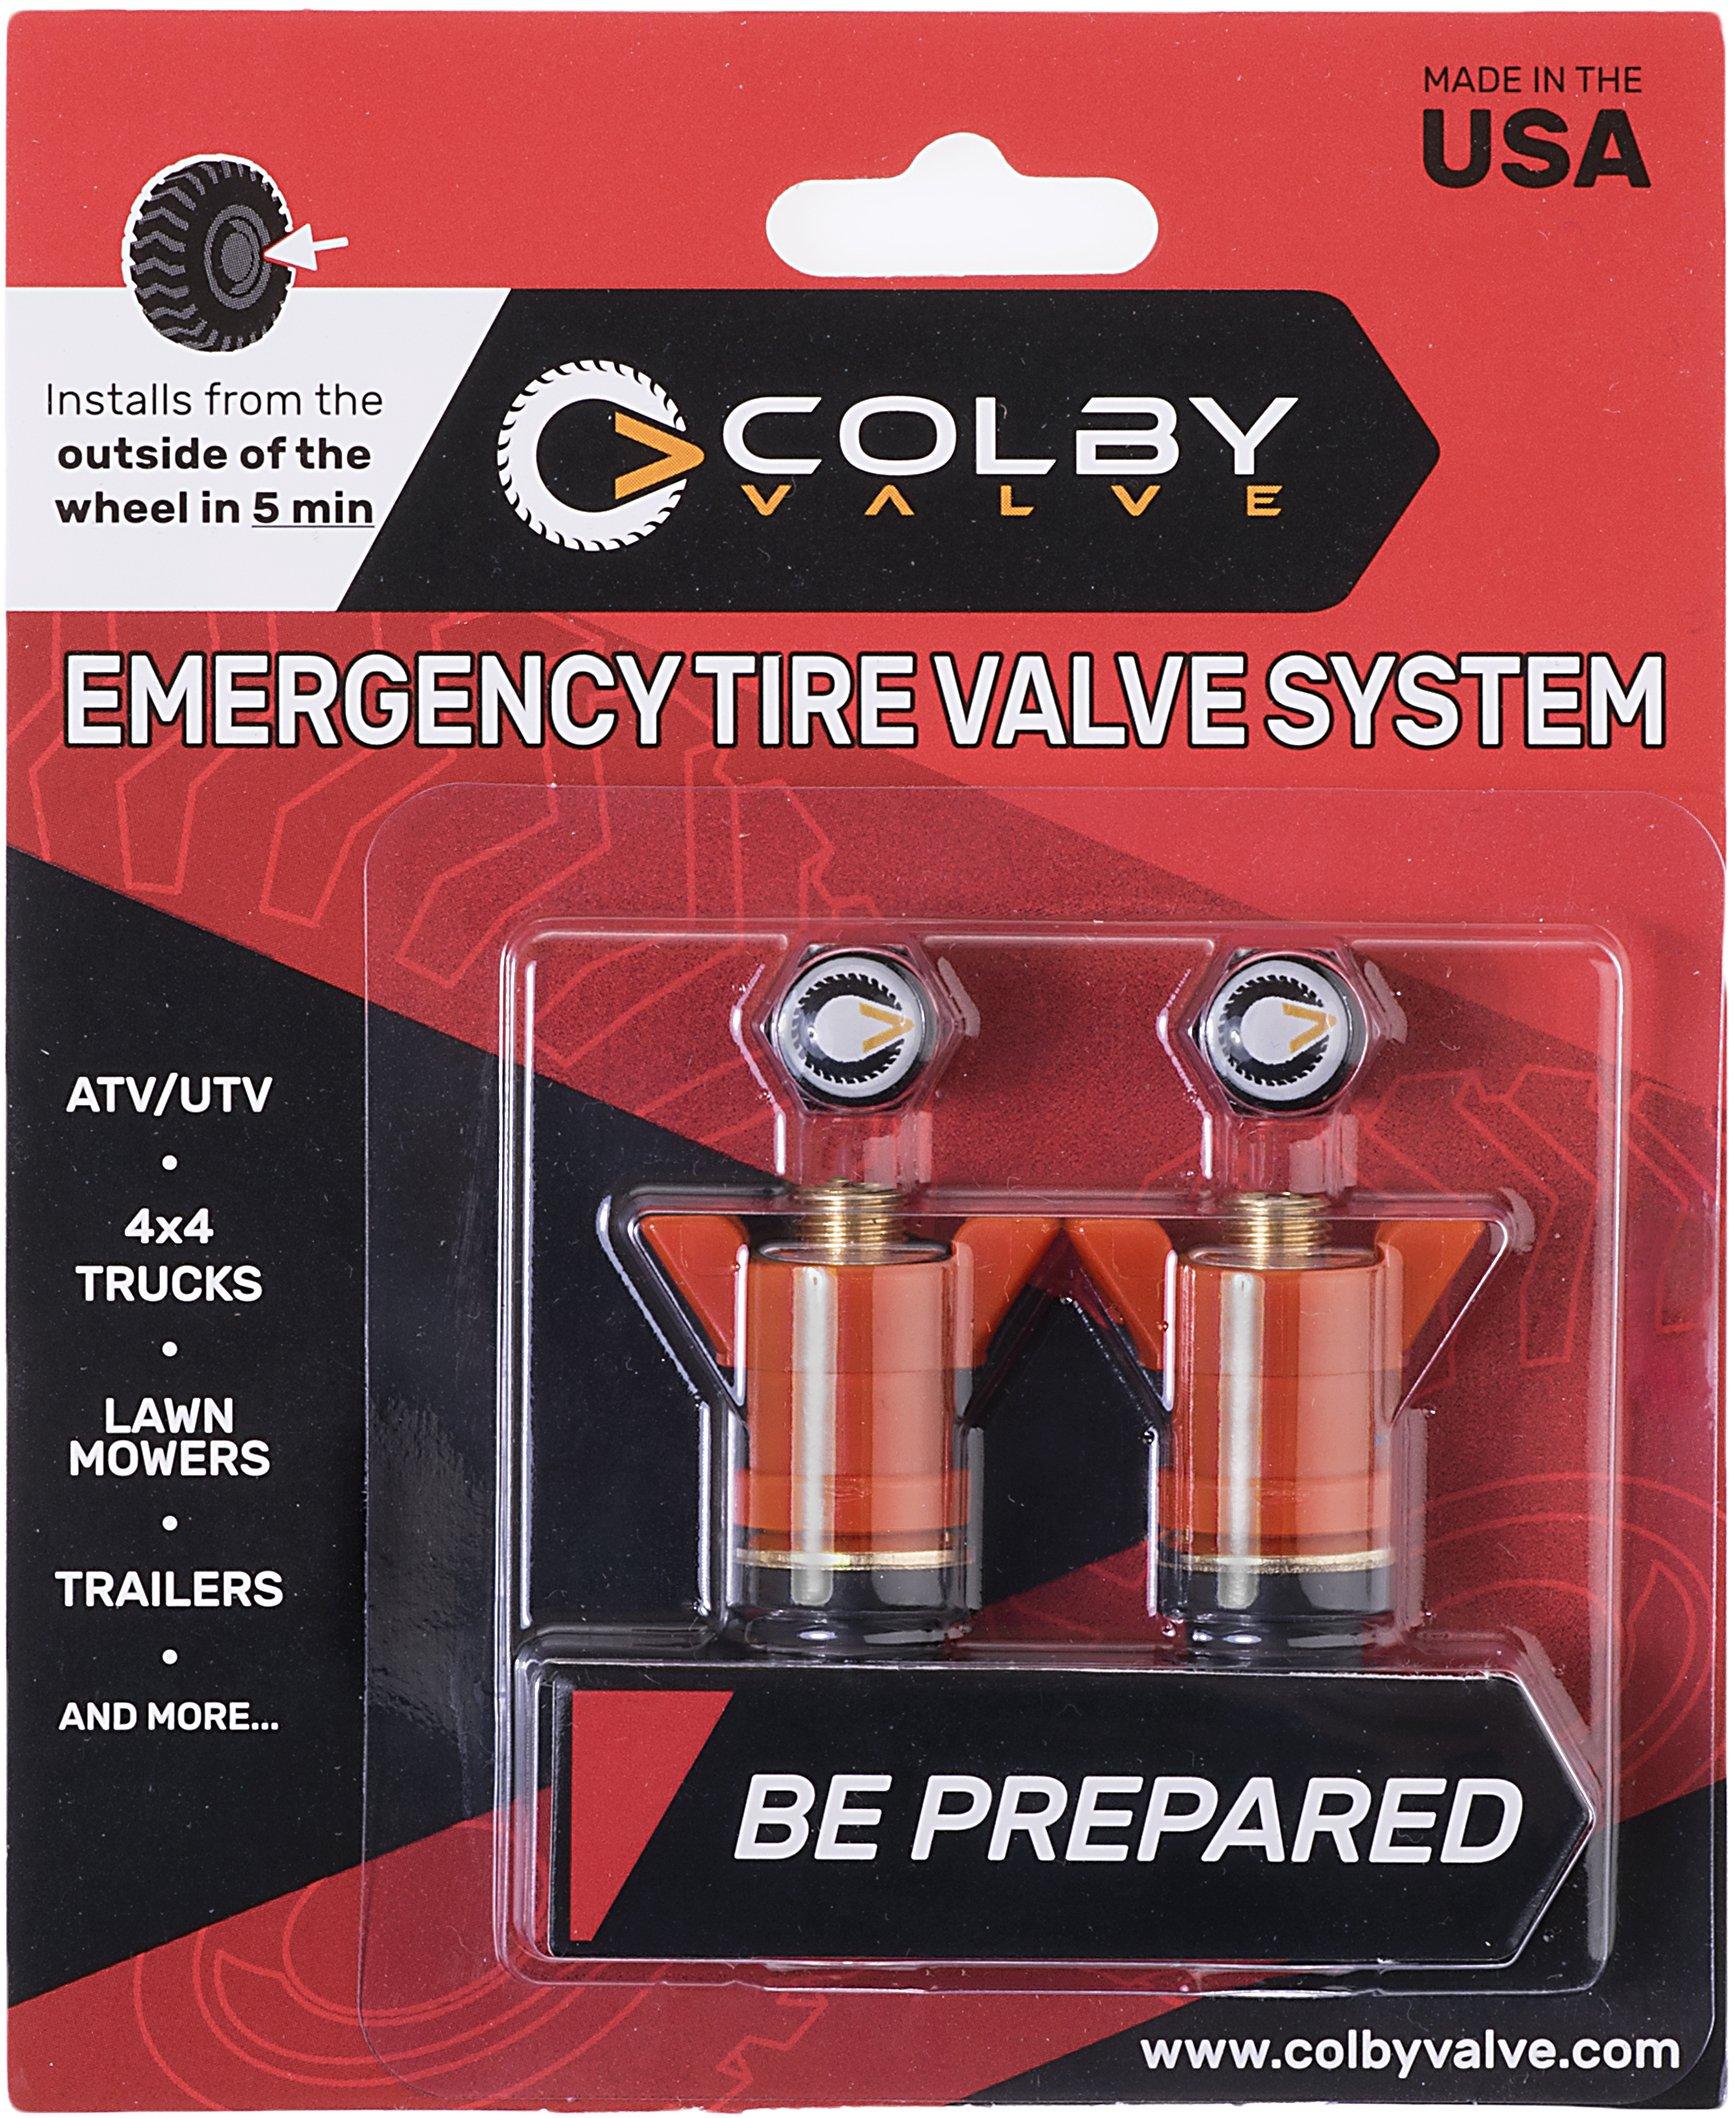 Colby Valve Emergency Valve Stem Replacement (Orange) ... by Colby Valve